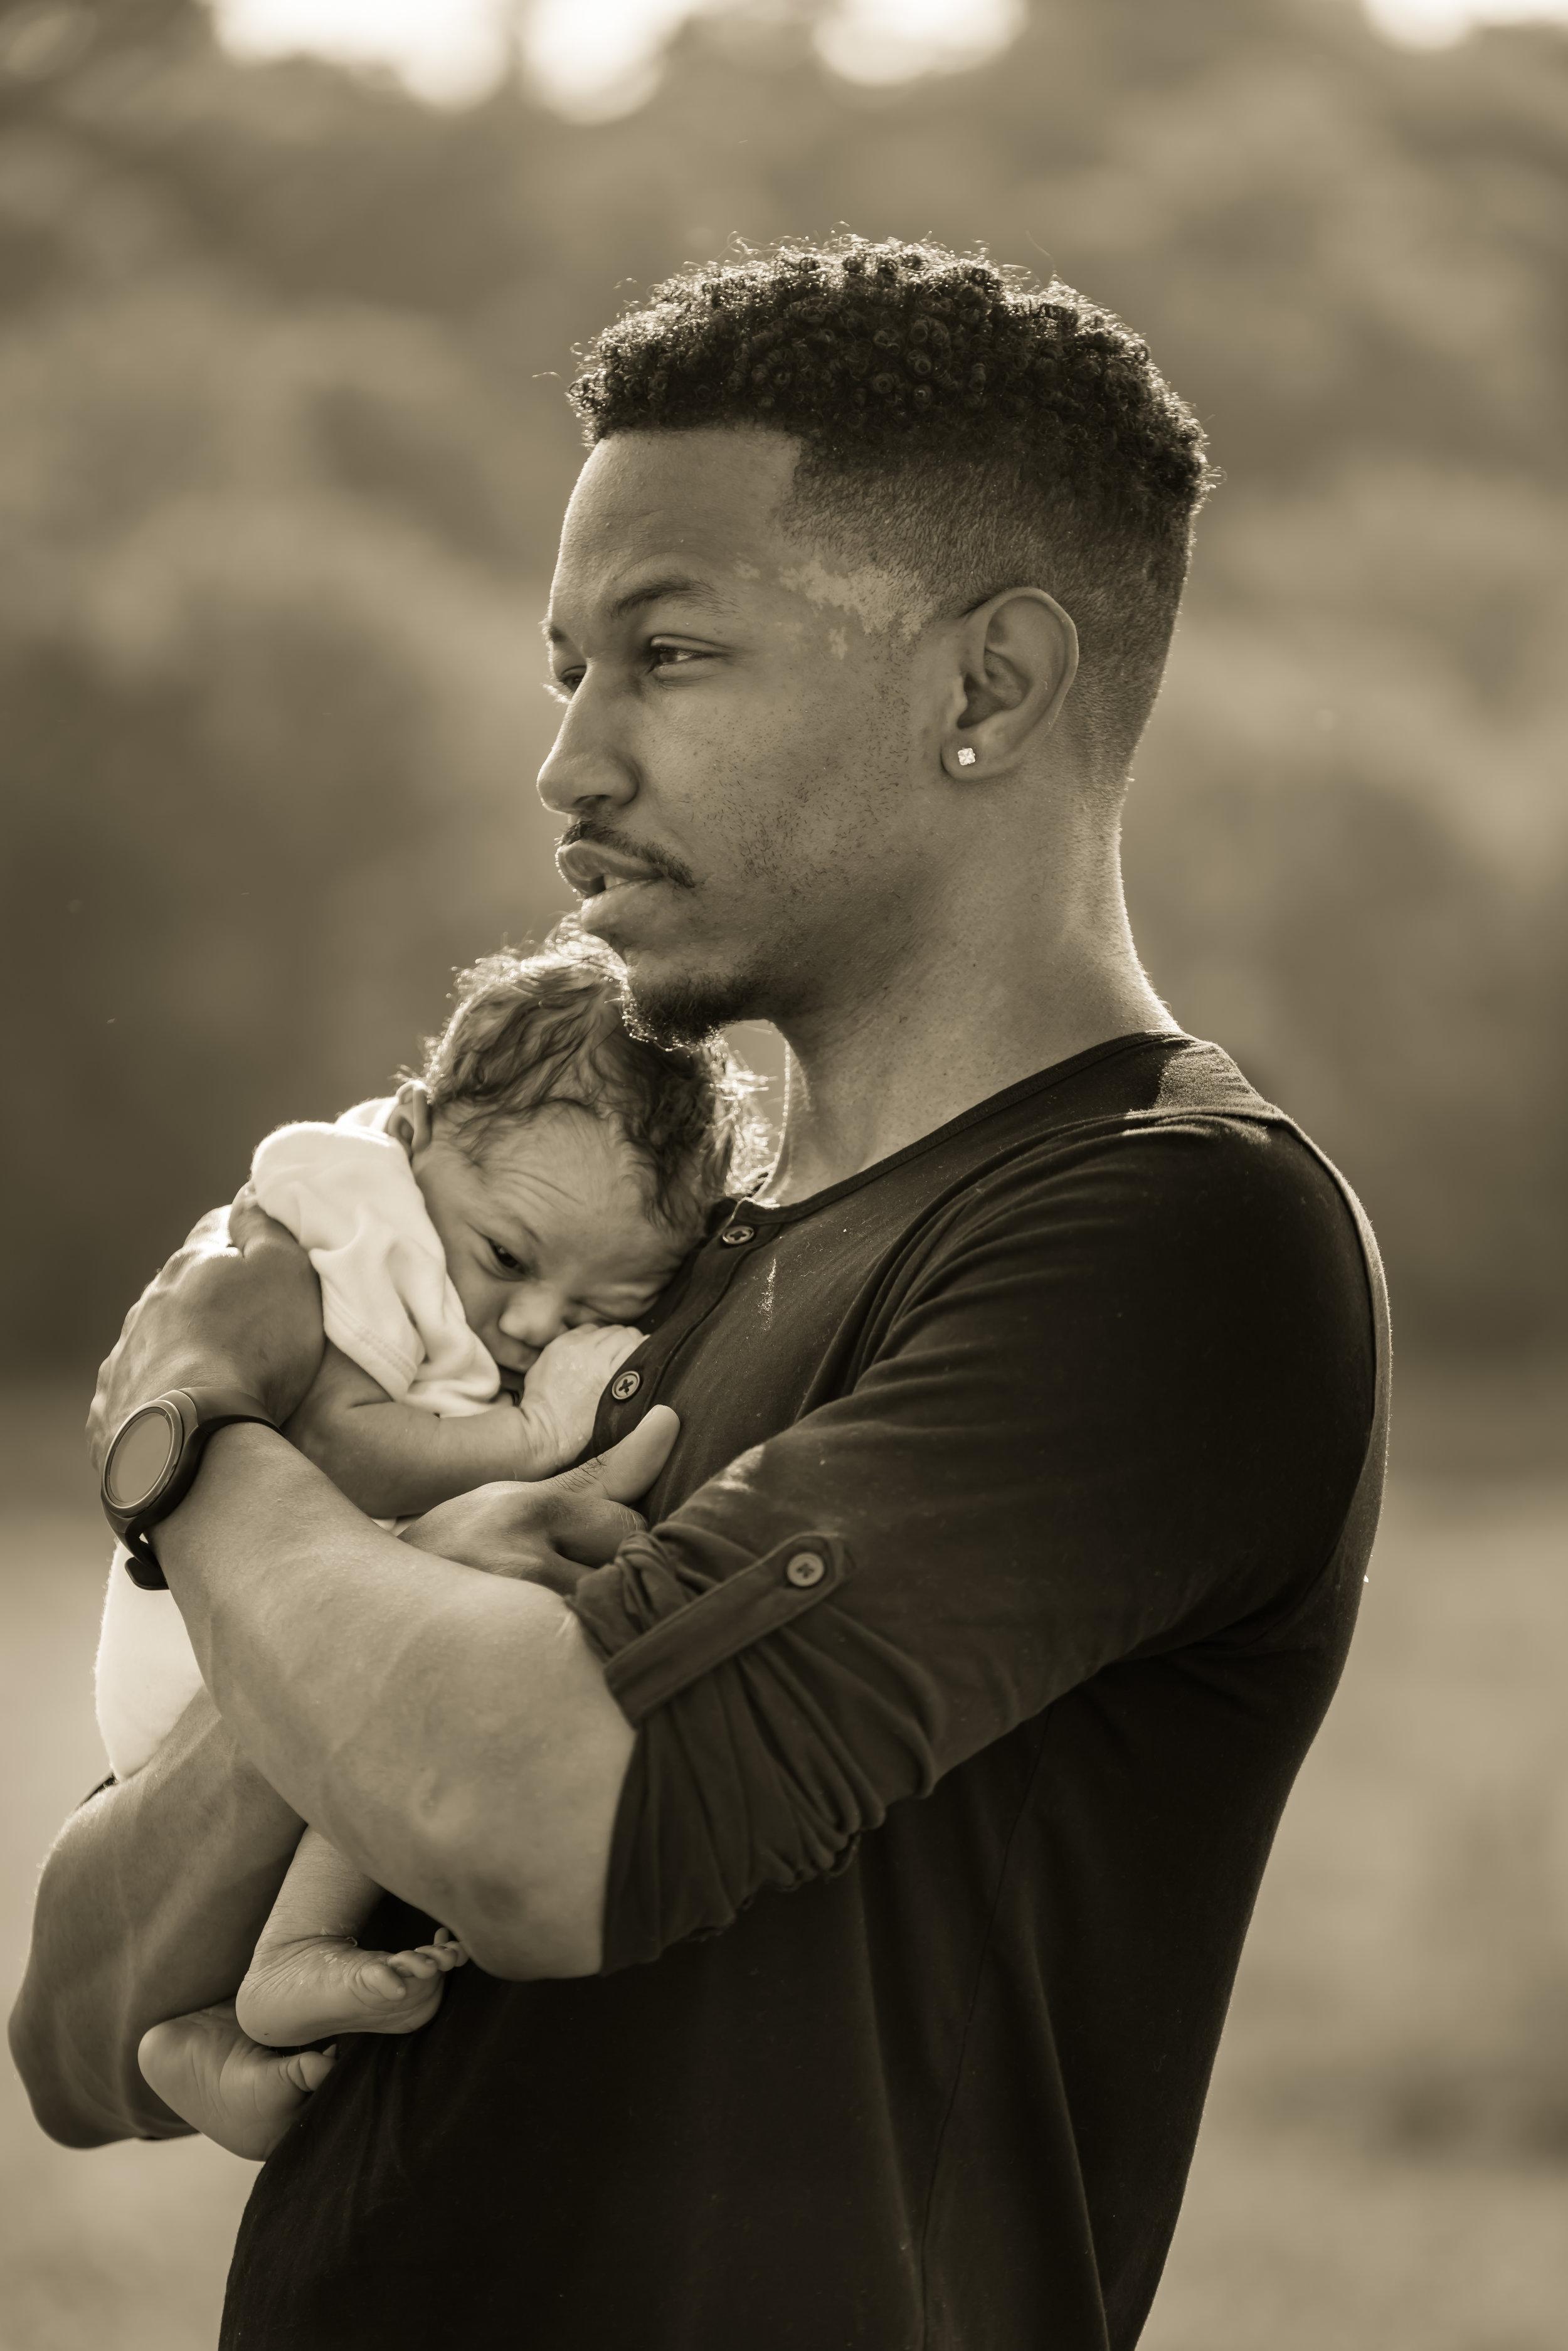 newborn family photo field photo louisville photographer